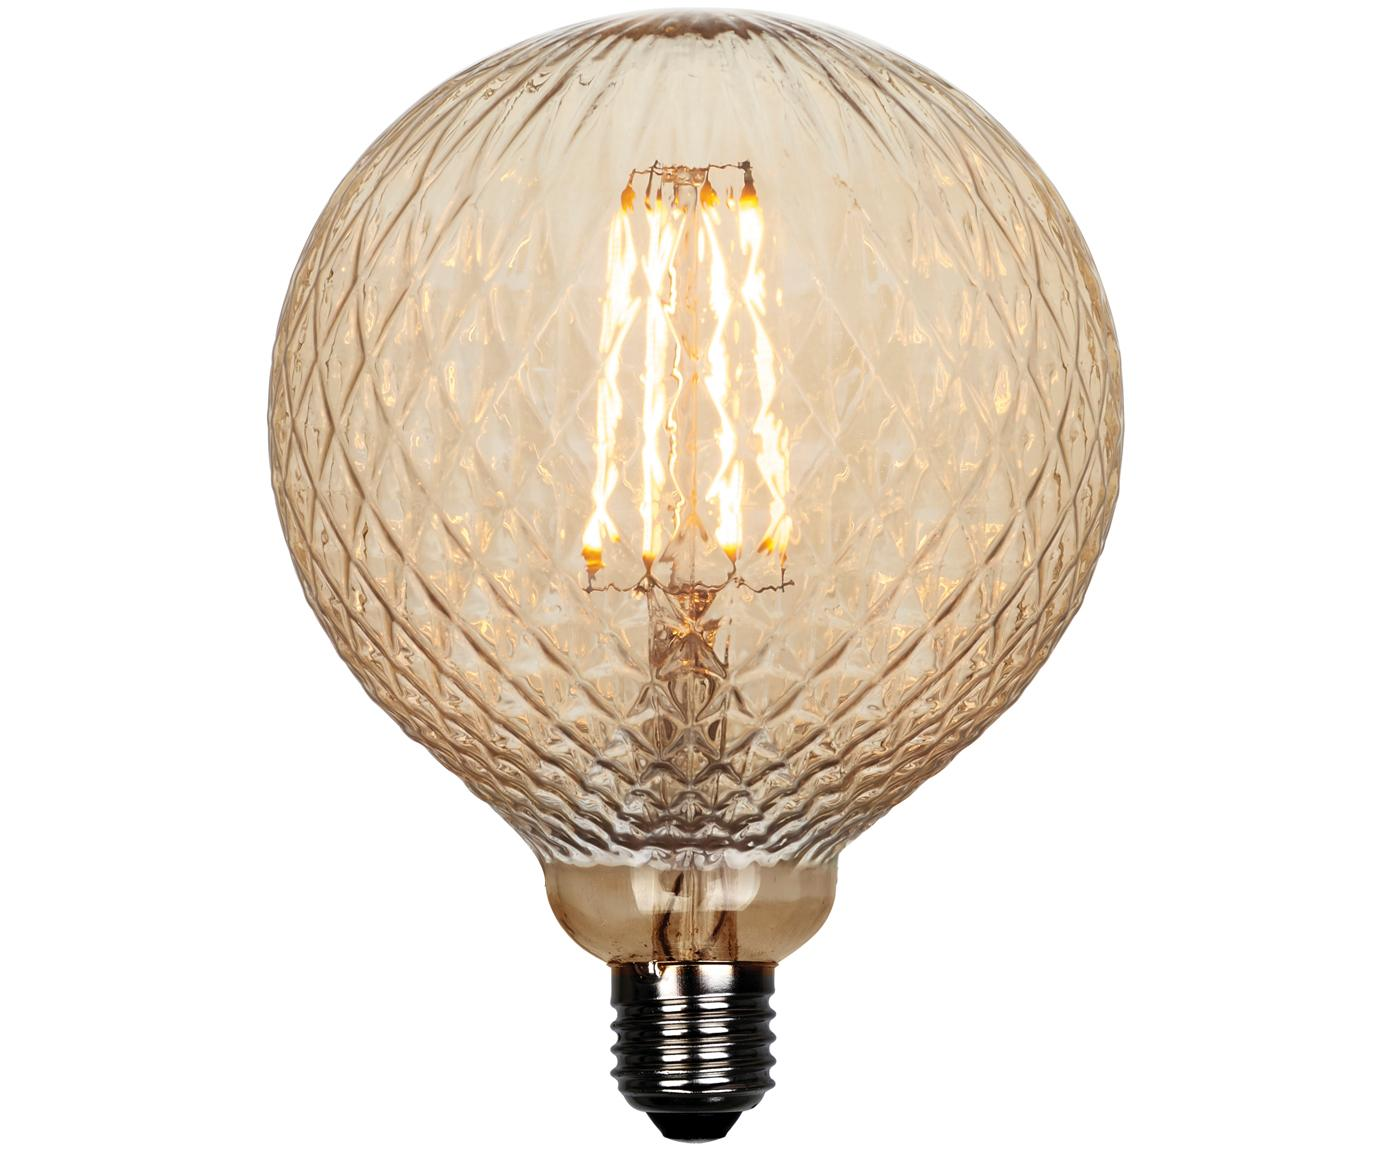 Żarówka LED XL Facet (E27 / 2 W), Beżowy, aluminium, Ø 13 x W 19 cm